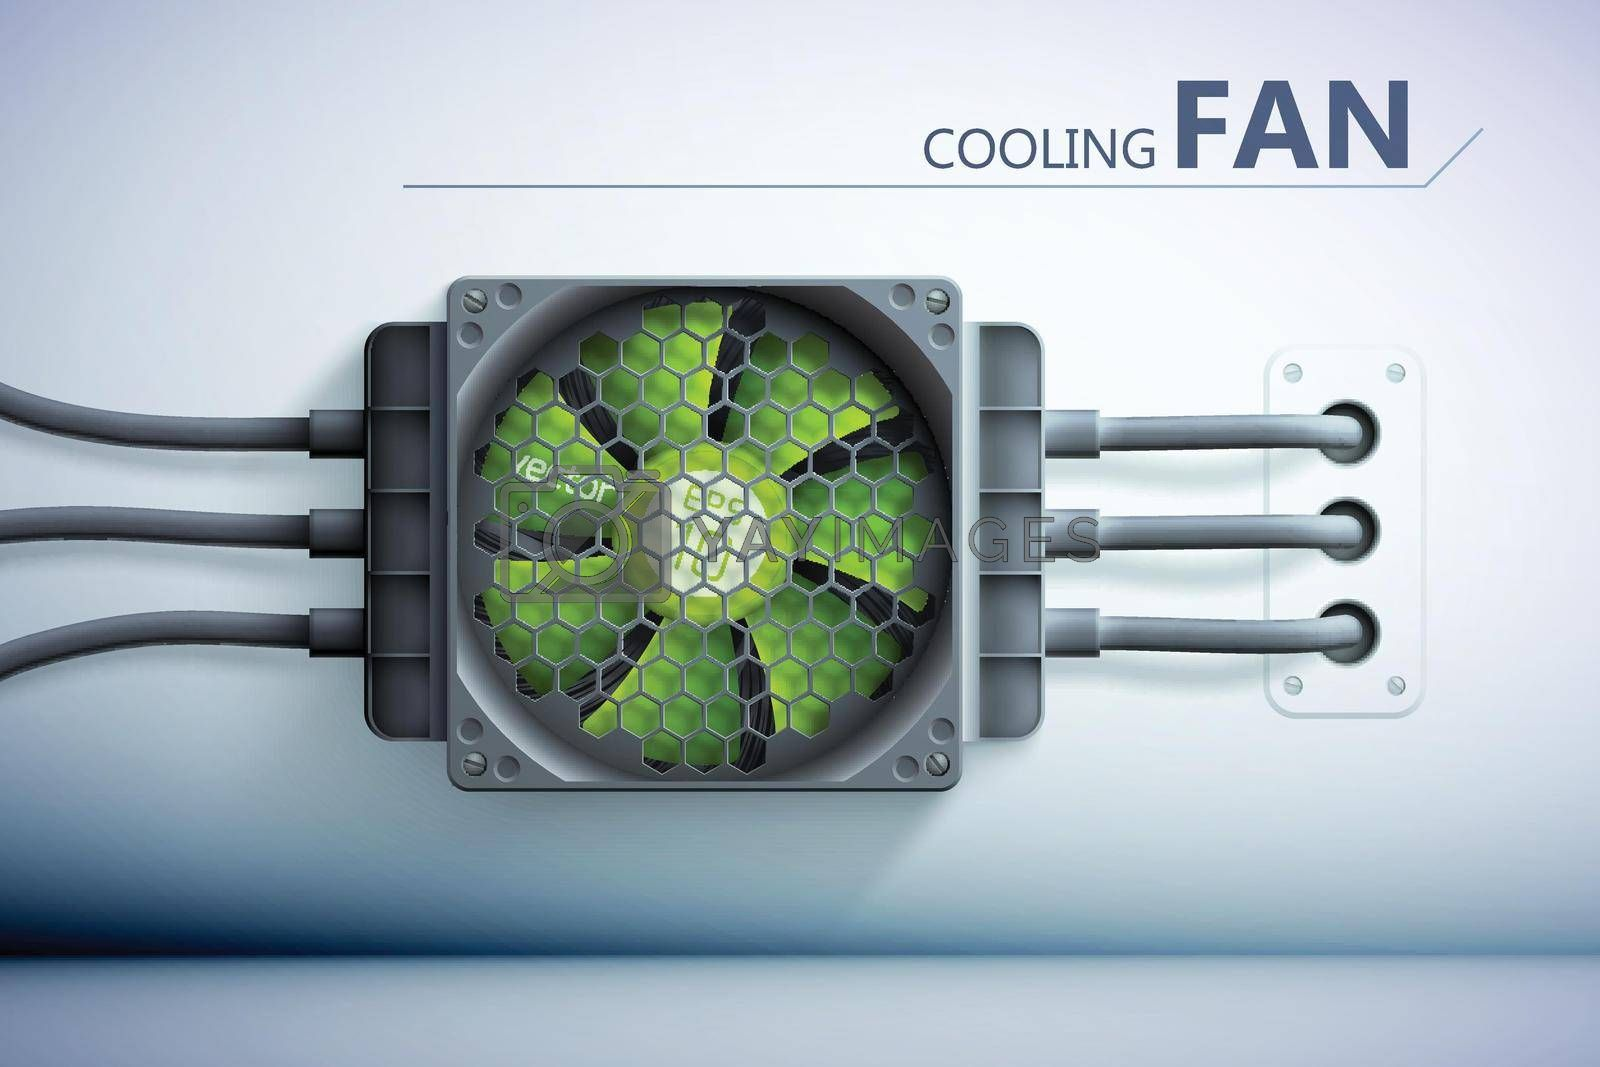 Royalty free image of Cooling Technology Background by mstjahanara